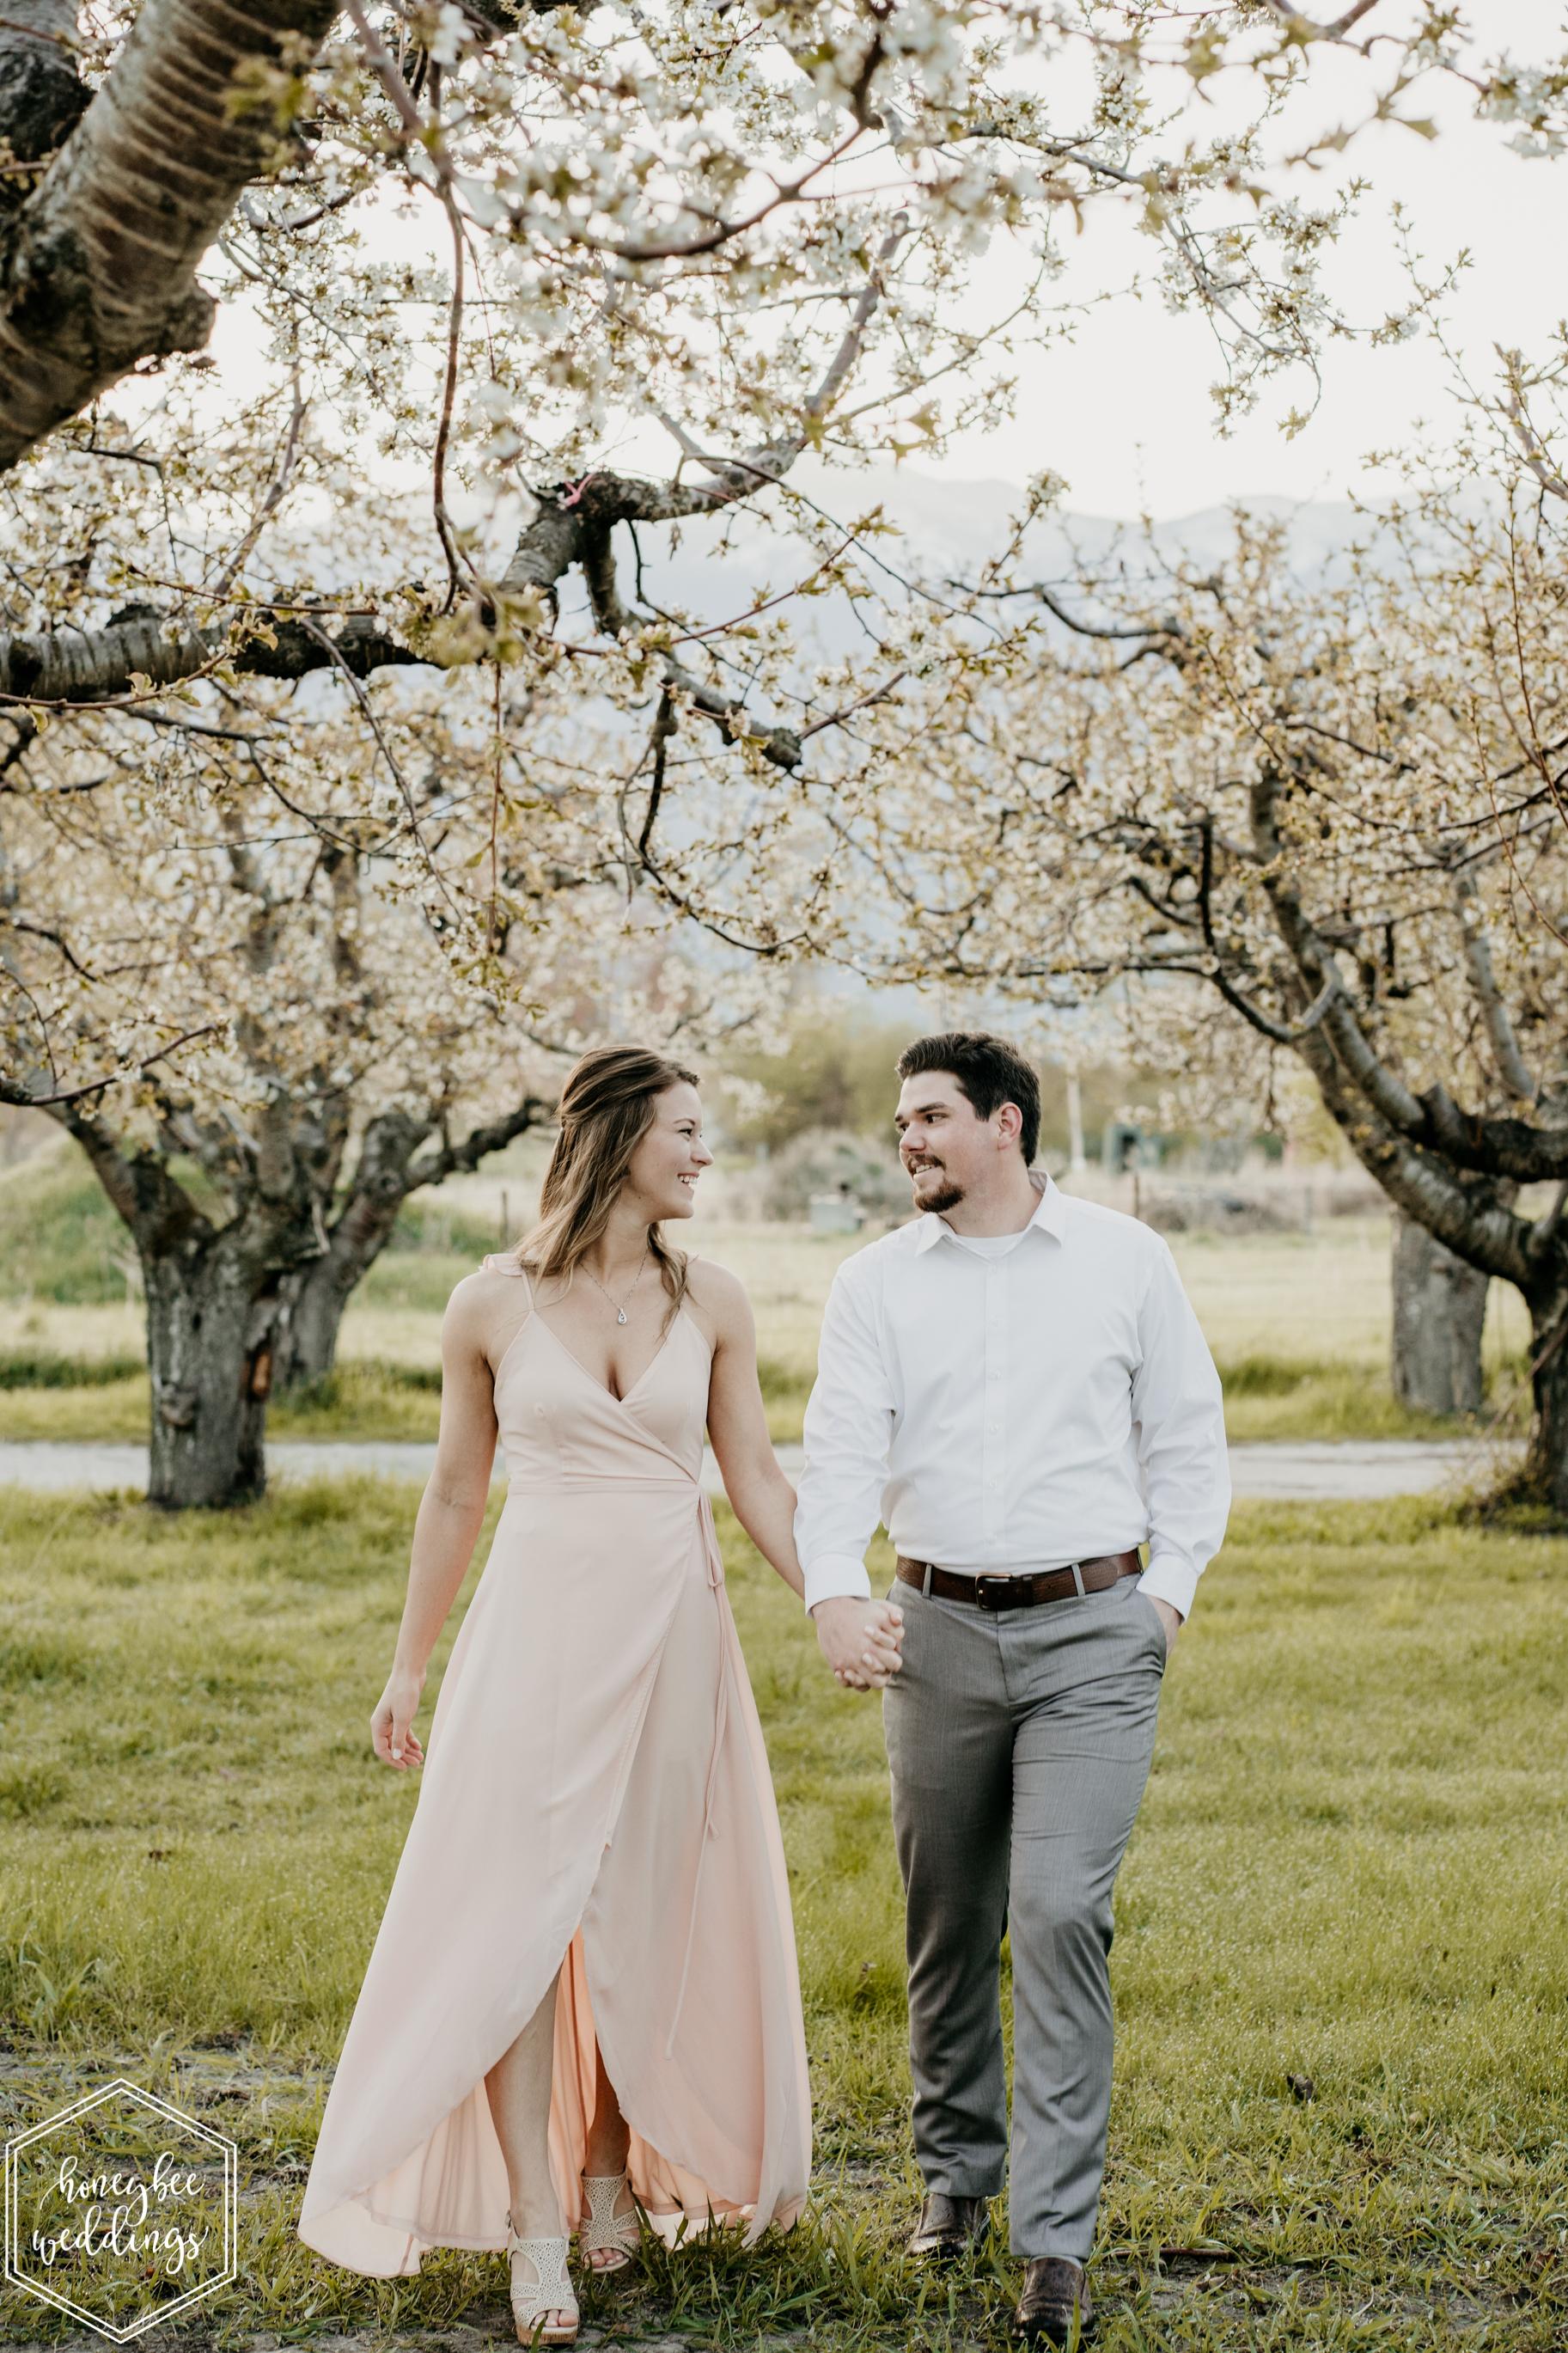 007Montana Wedding Photographer_Cherry Blossom Engagement Session_Ashlin & Luke_Honeybee Weddings_May 11, 2019-34.jpg